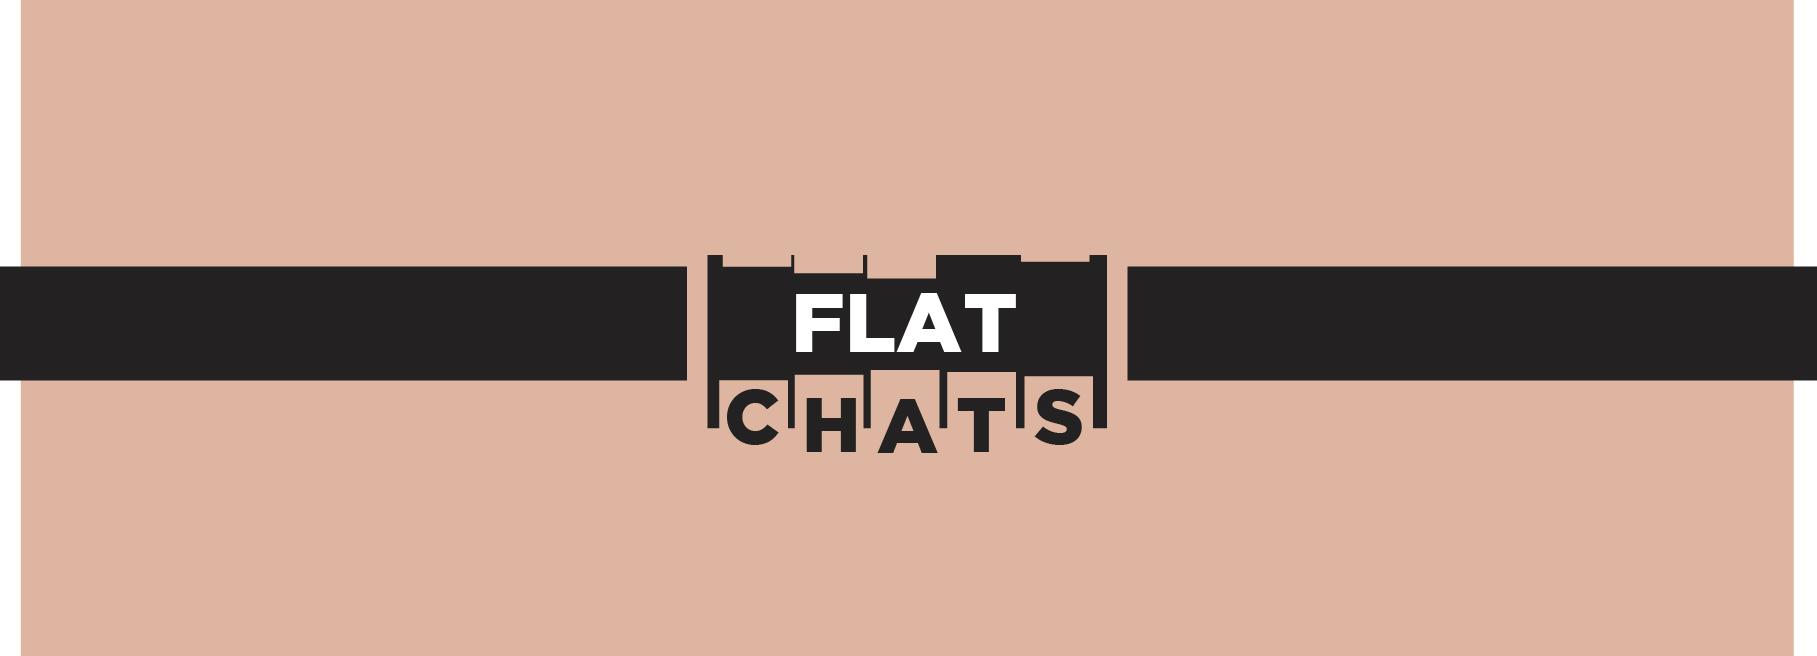 Flat Chats